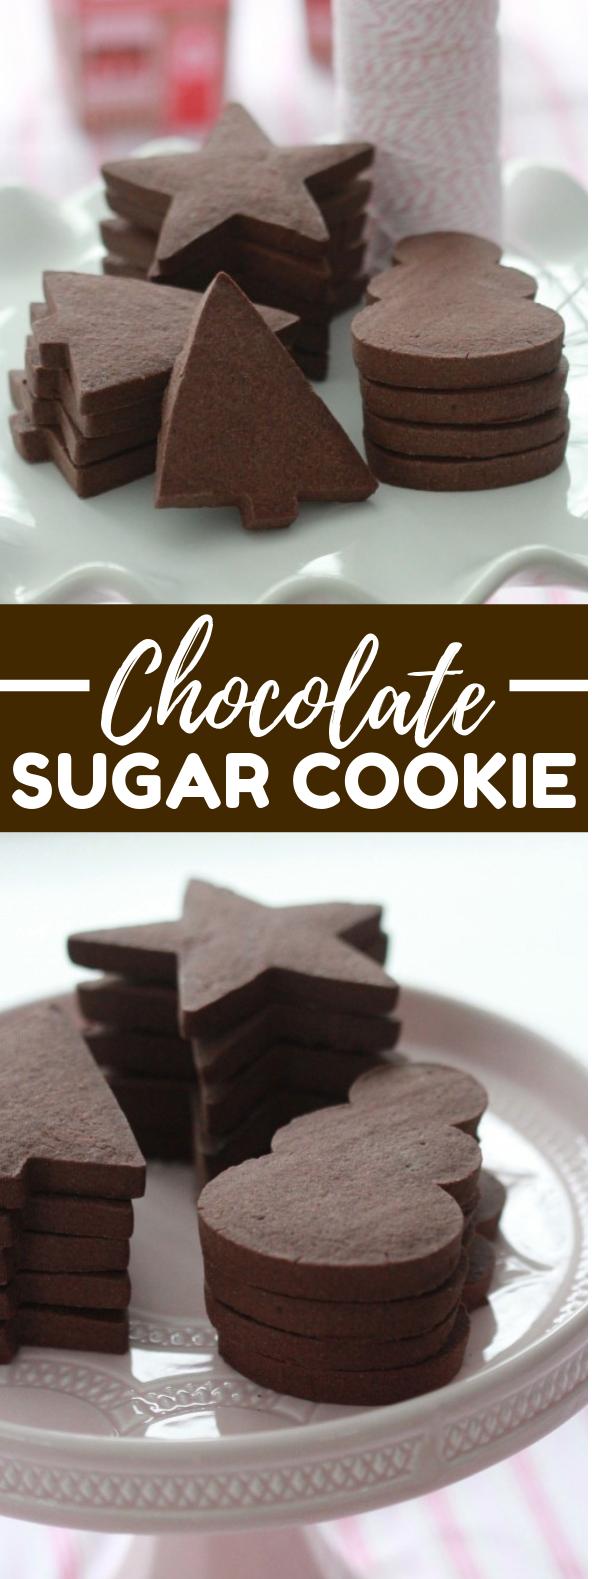 Sugar Cookie Recipe {Cut Out Cookies} Chocolate Sugar Cookie Recipe {Cut Out Cookies}Chocolate Sugar Cookie Recipe {Cut Out Cookies}